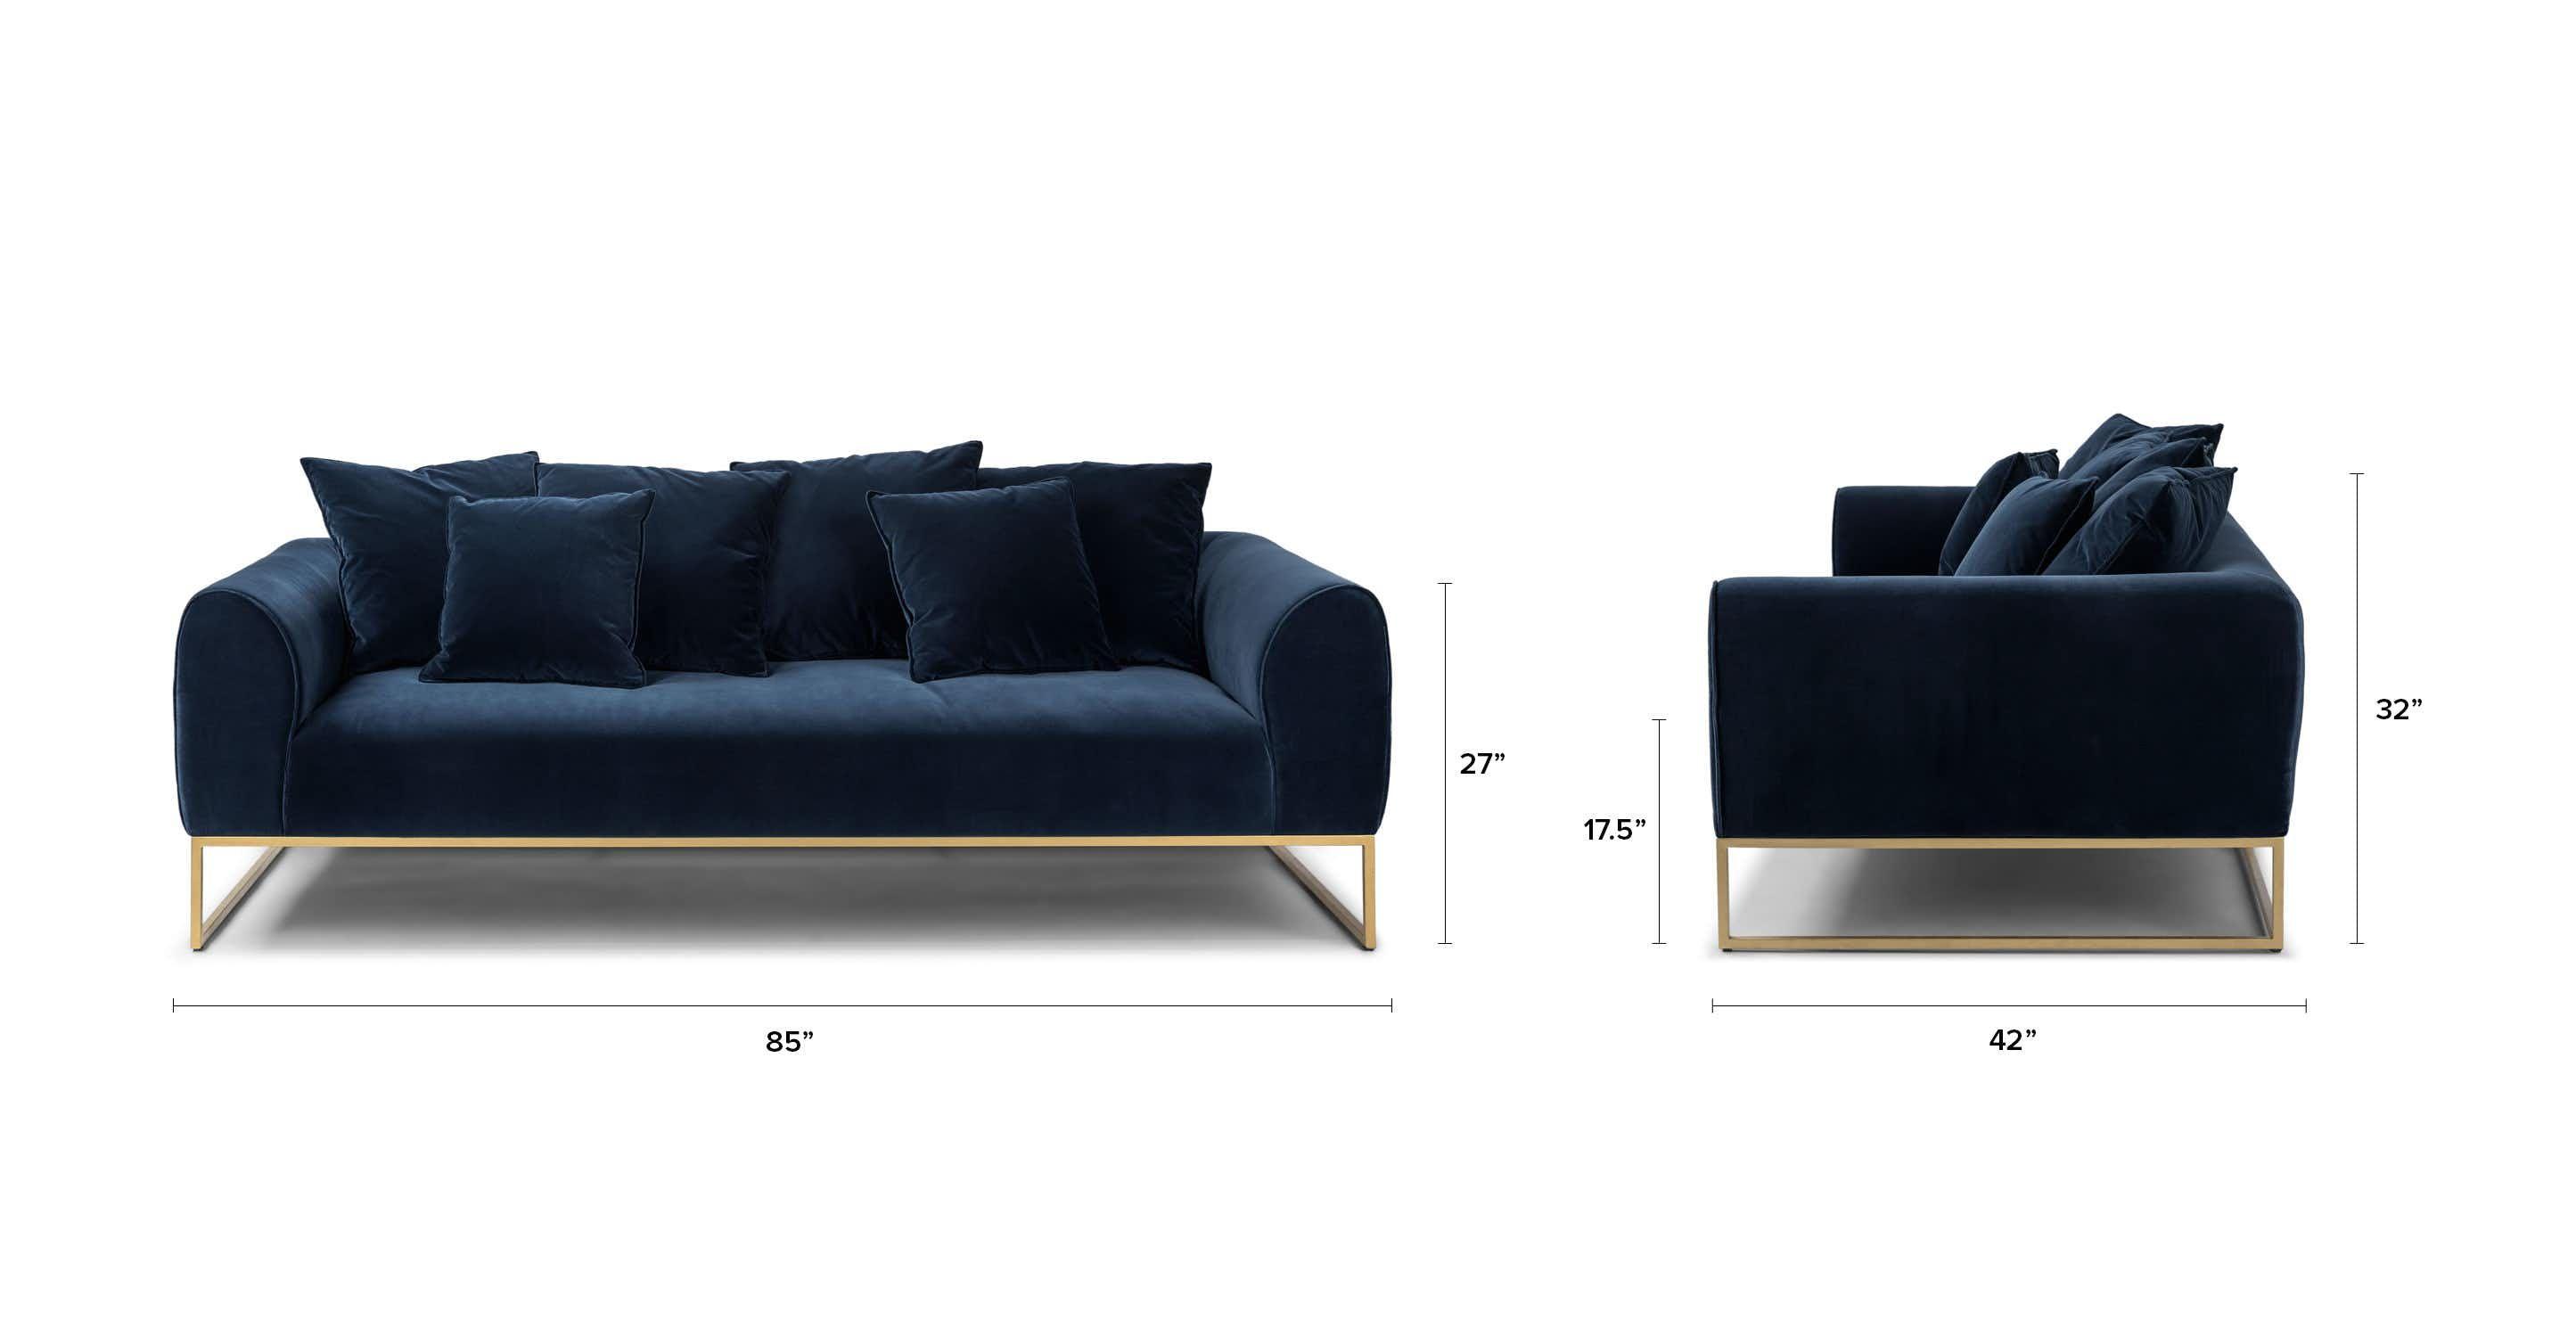 Kits Cascadia Blue Sofa | Blue sofa, Green sofa, Modern ... on Cascadia Outdoor Living Spaces id=88265